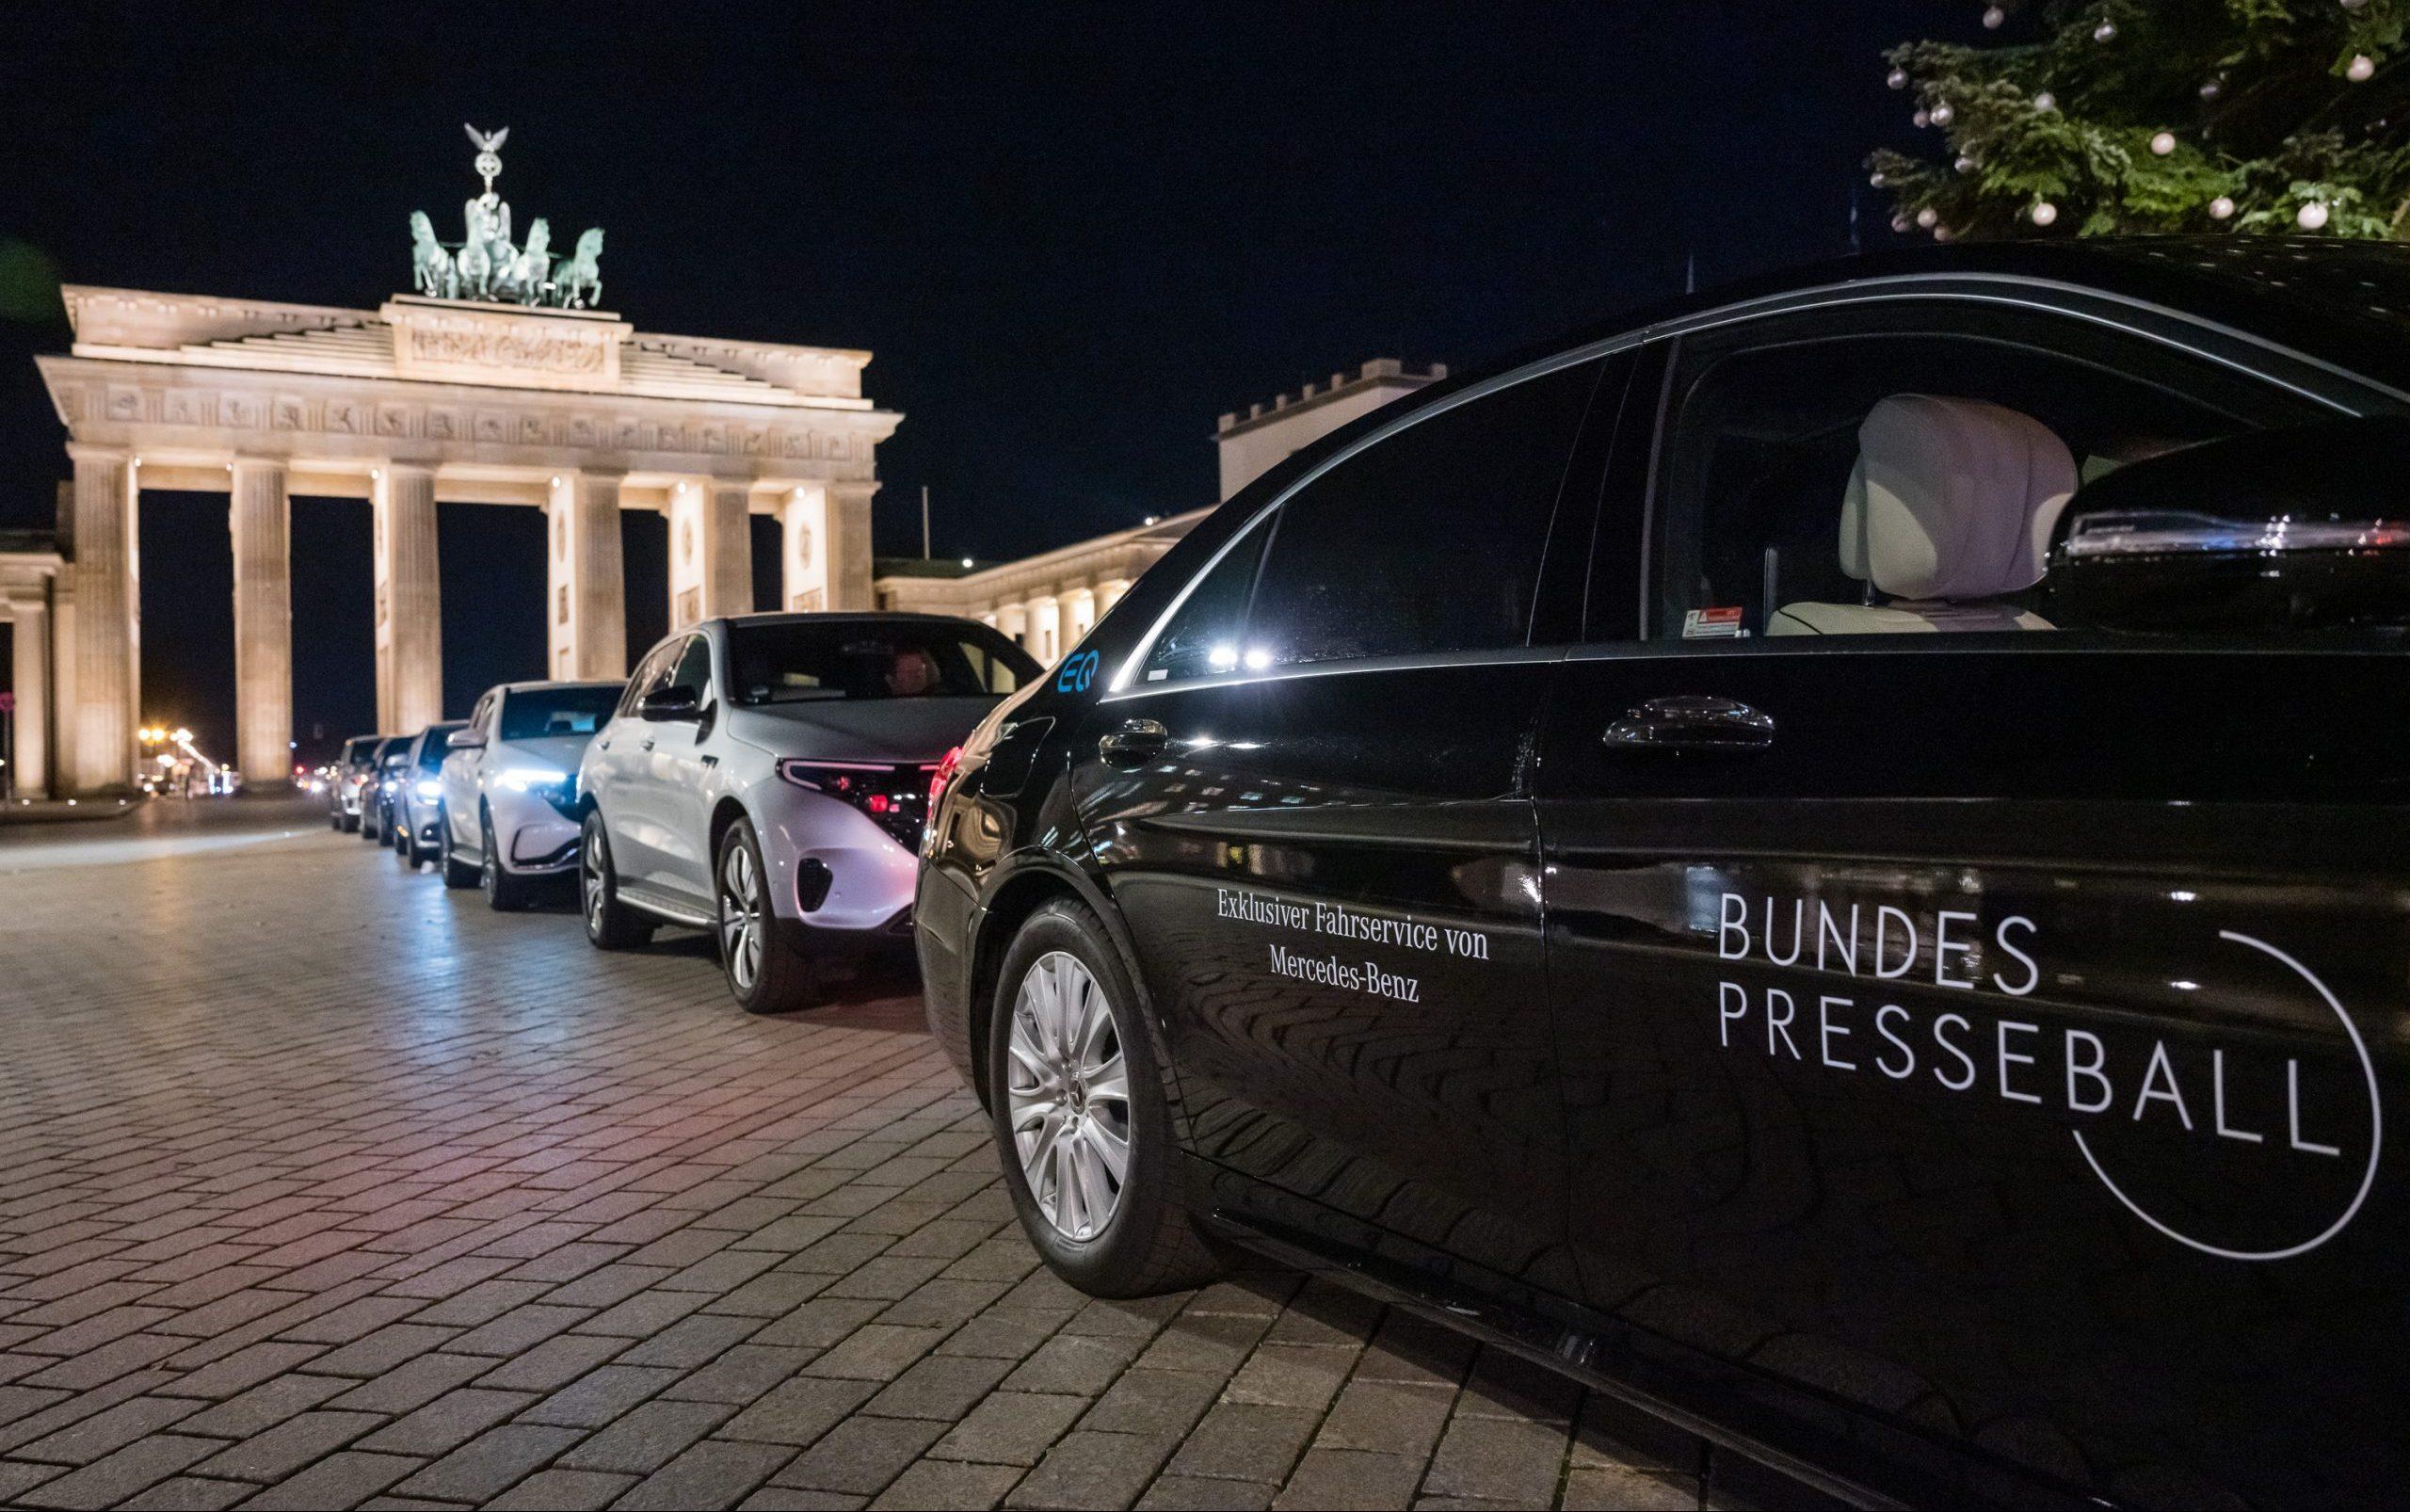 20191129_Bundespresseball_1058-scaled-e1576661010185